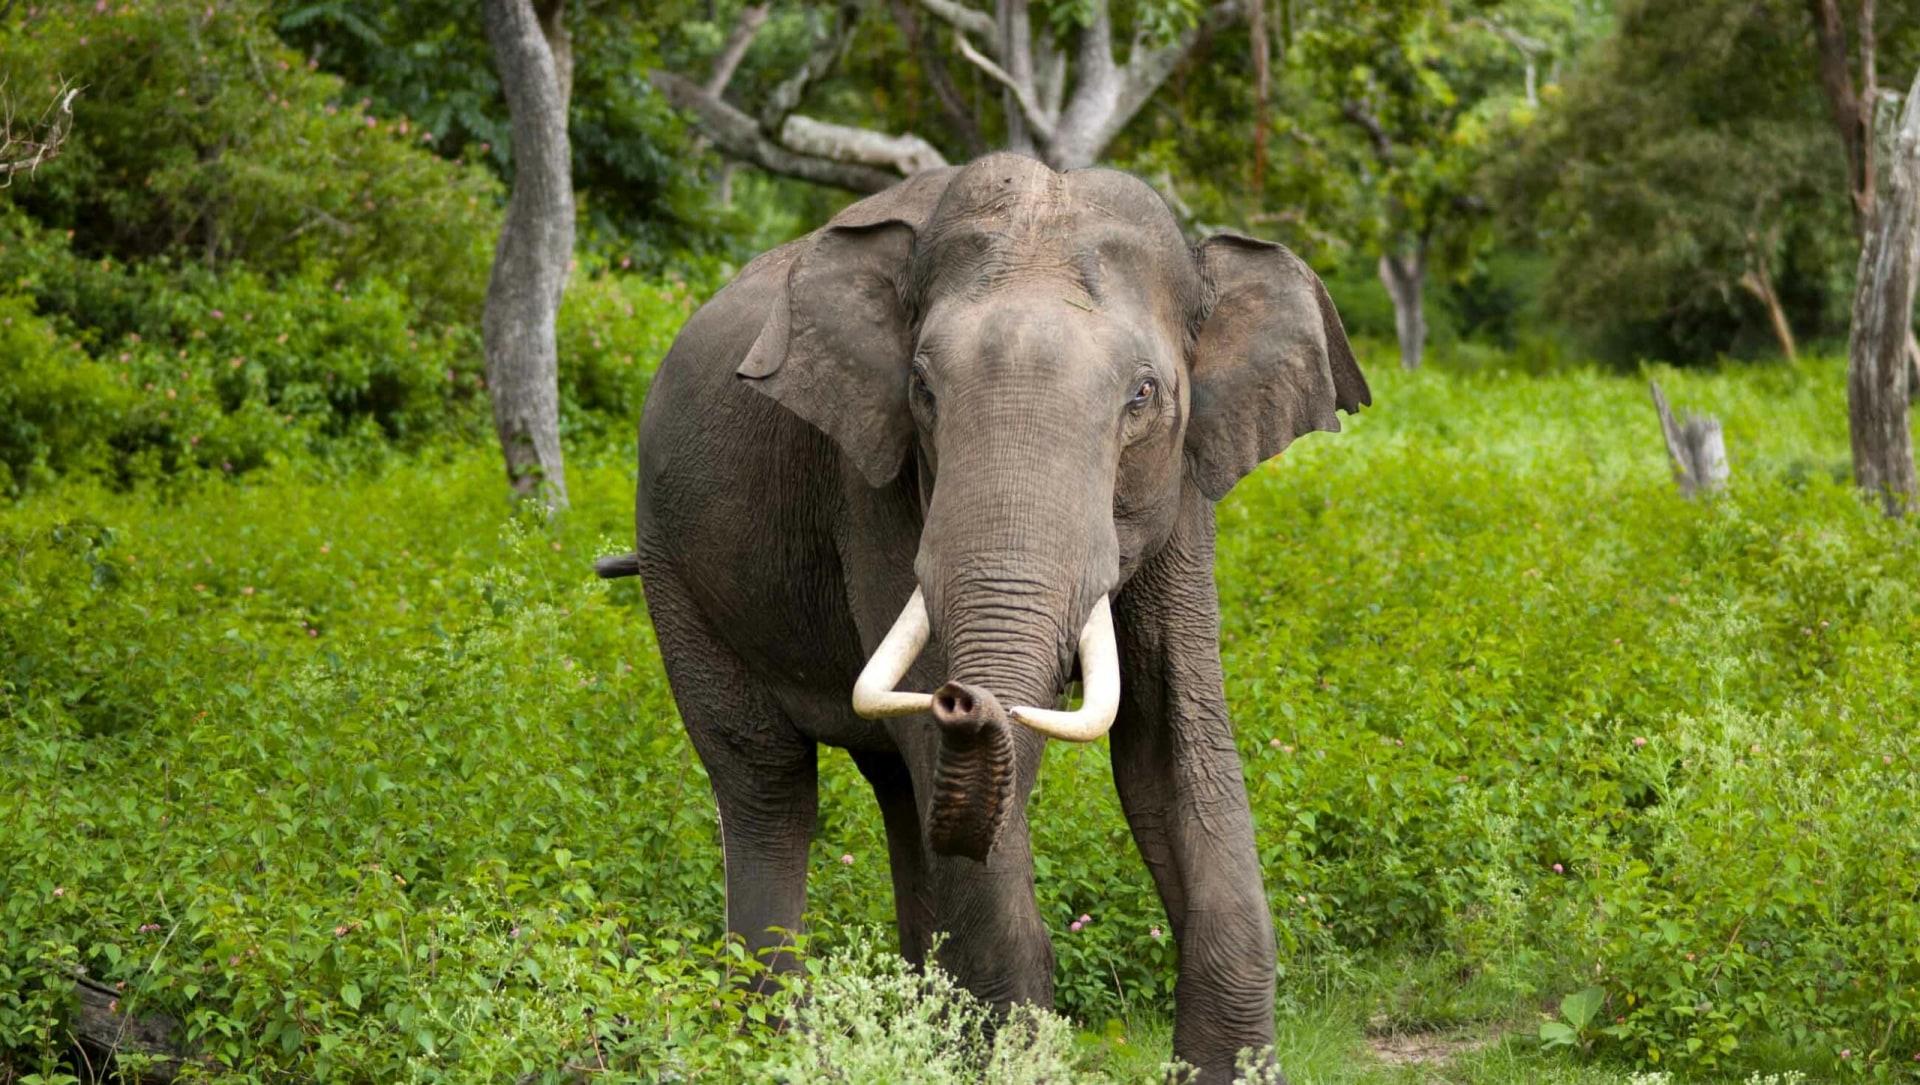 Can Feeding Wild Elephants Paddy Reduce Human-Wildlife Conflict?